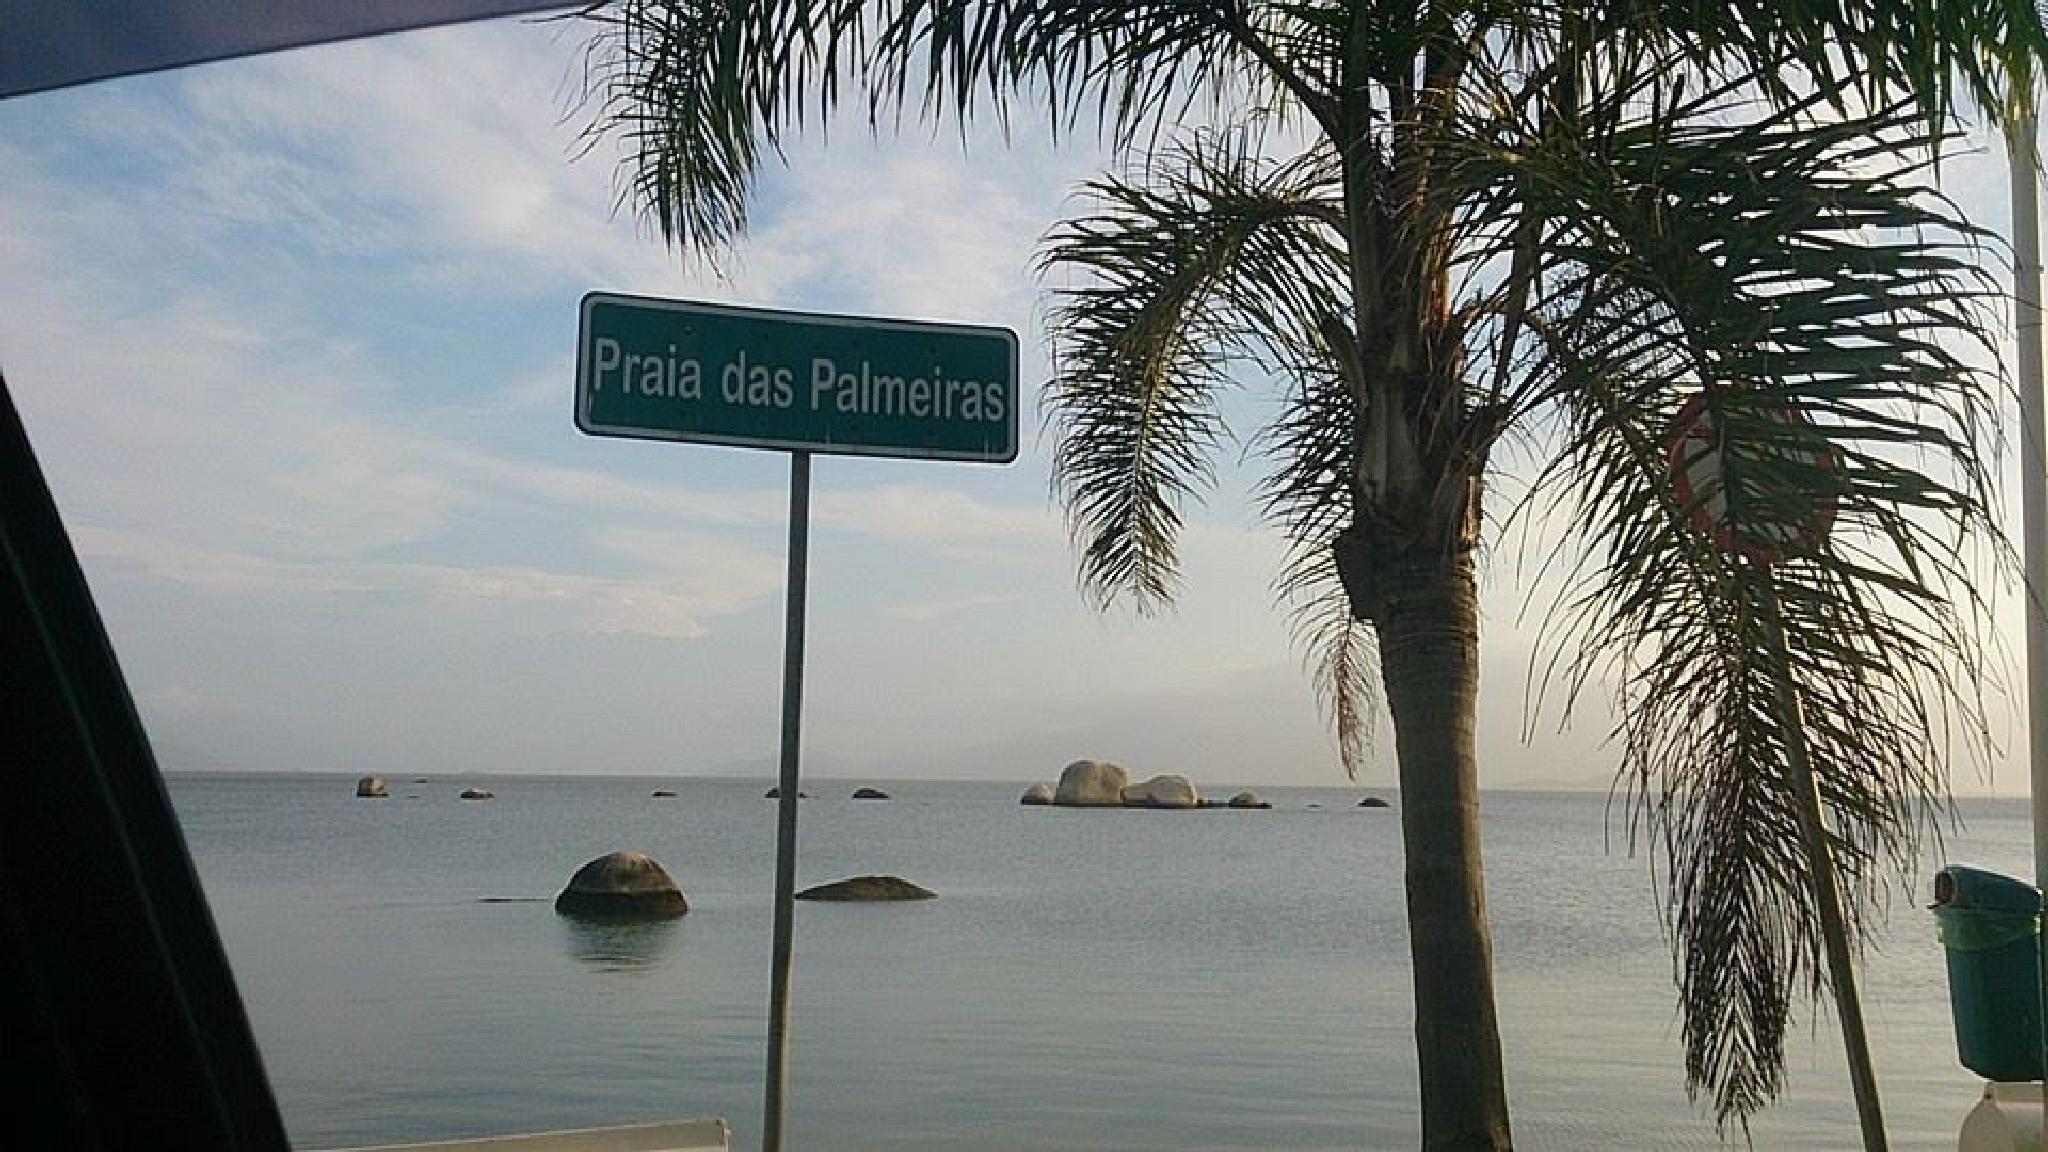 Praia das Palmeiras by amokwa